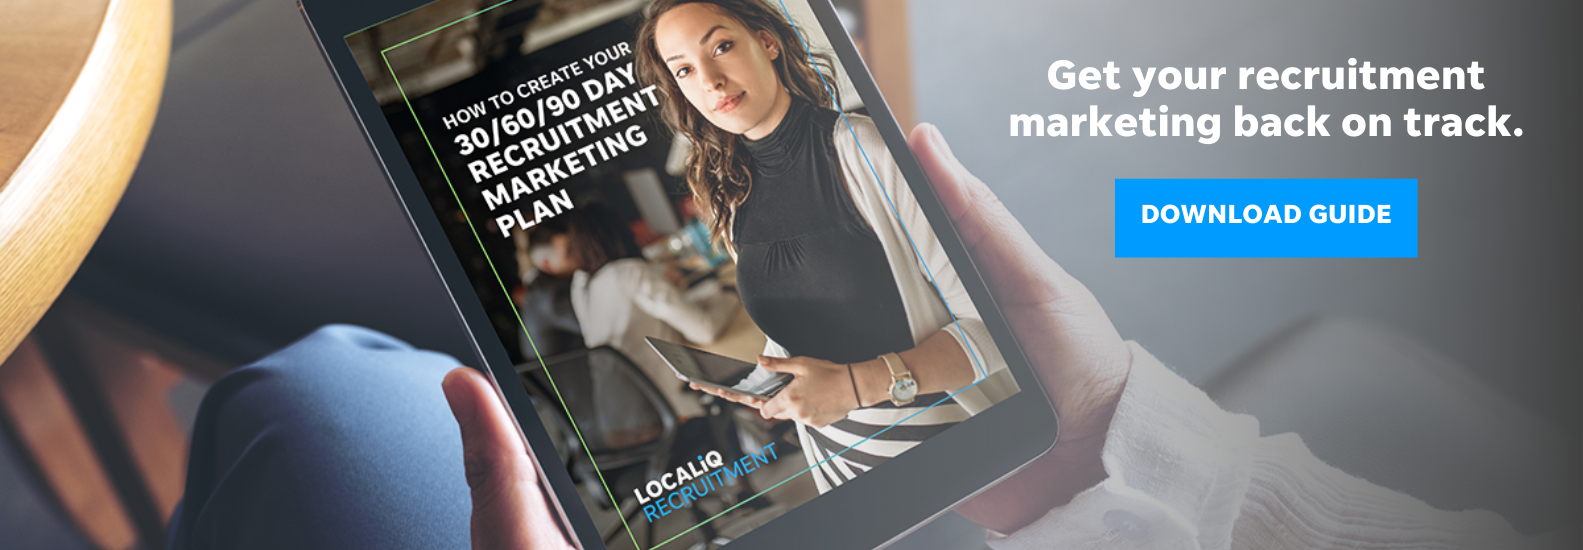 Recruitment Marketing Remote Working